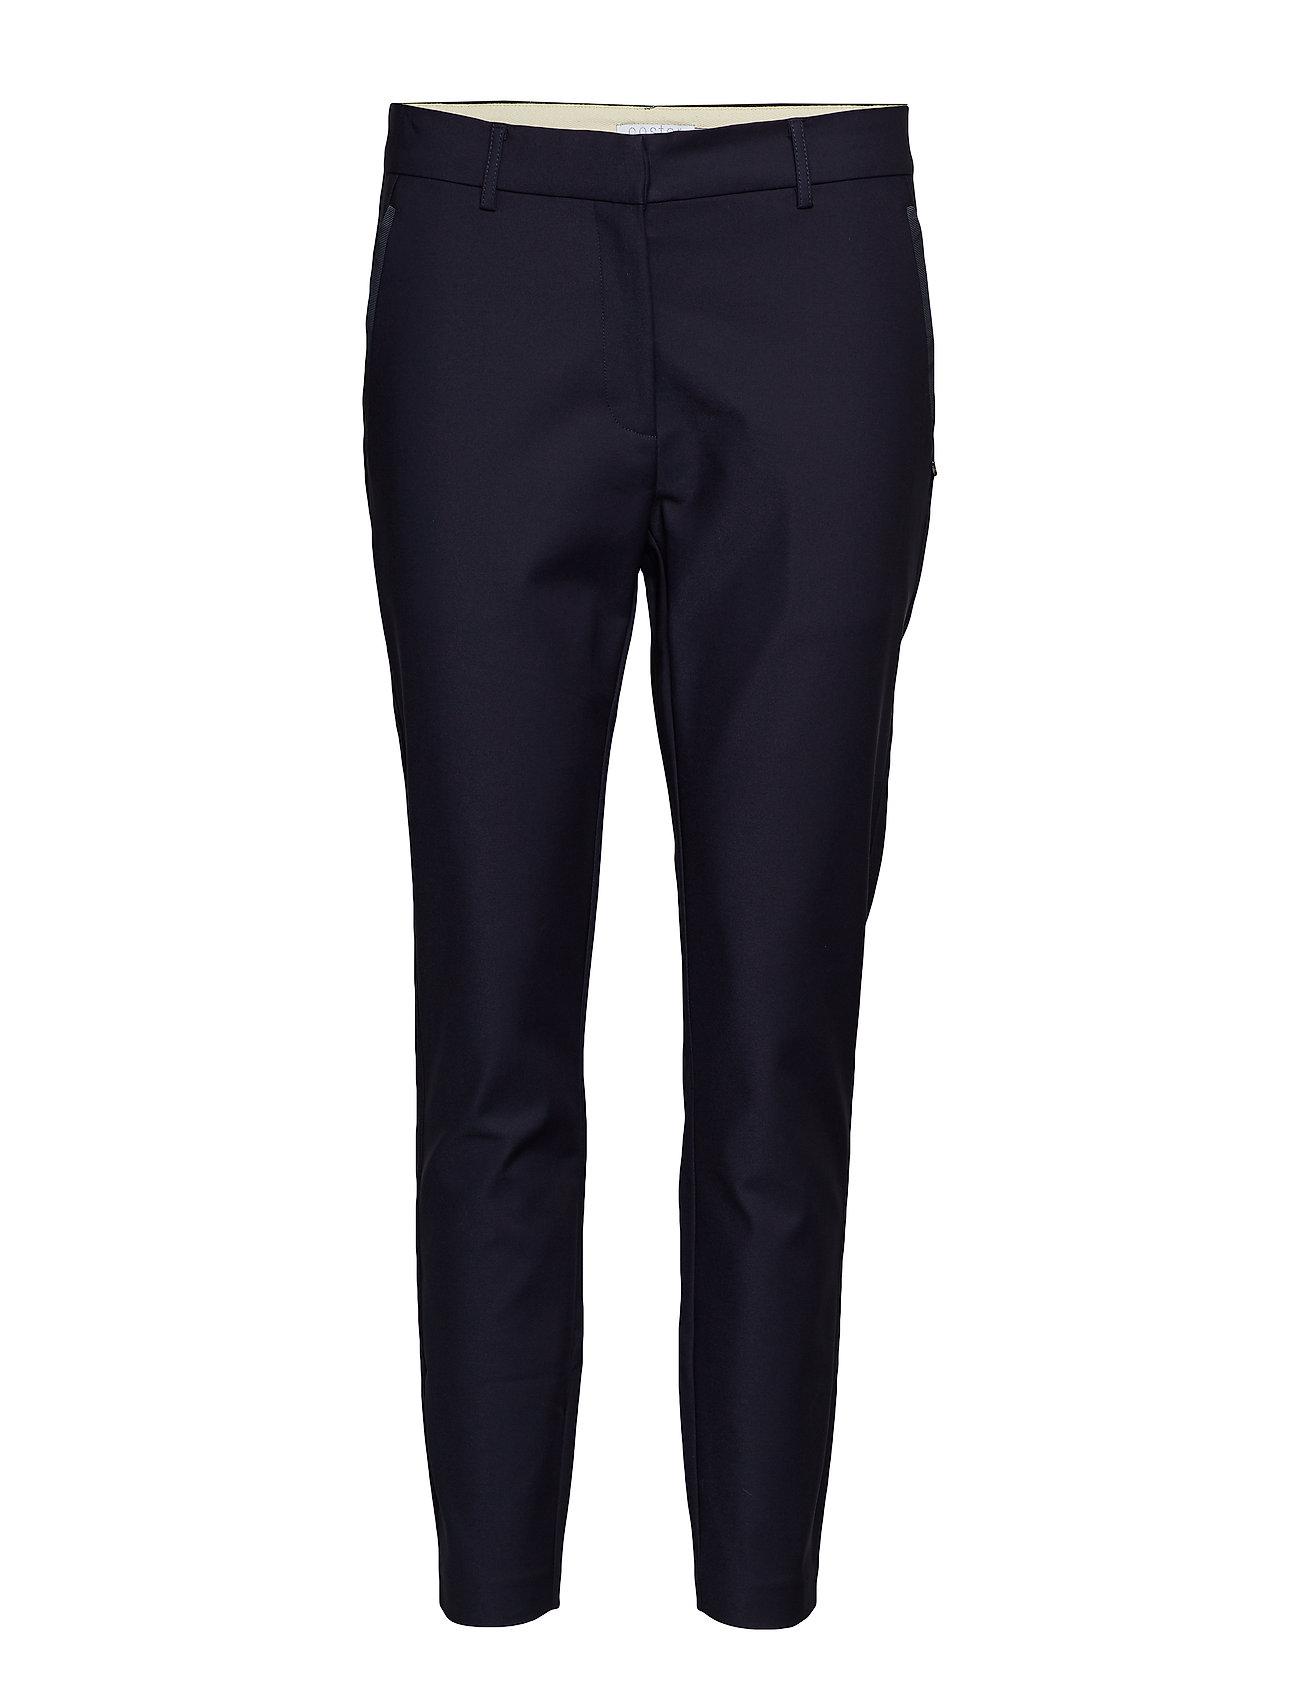 Zipper BlueCoster Sky PocketsJulianight With Pants Copenhagen QdrBeCoxW